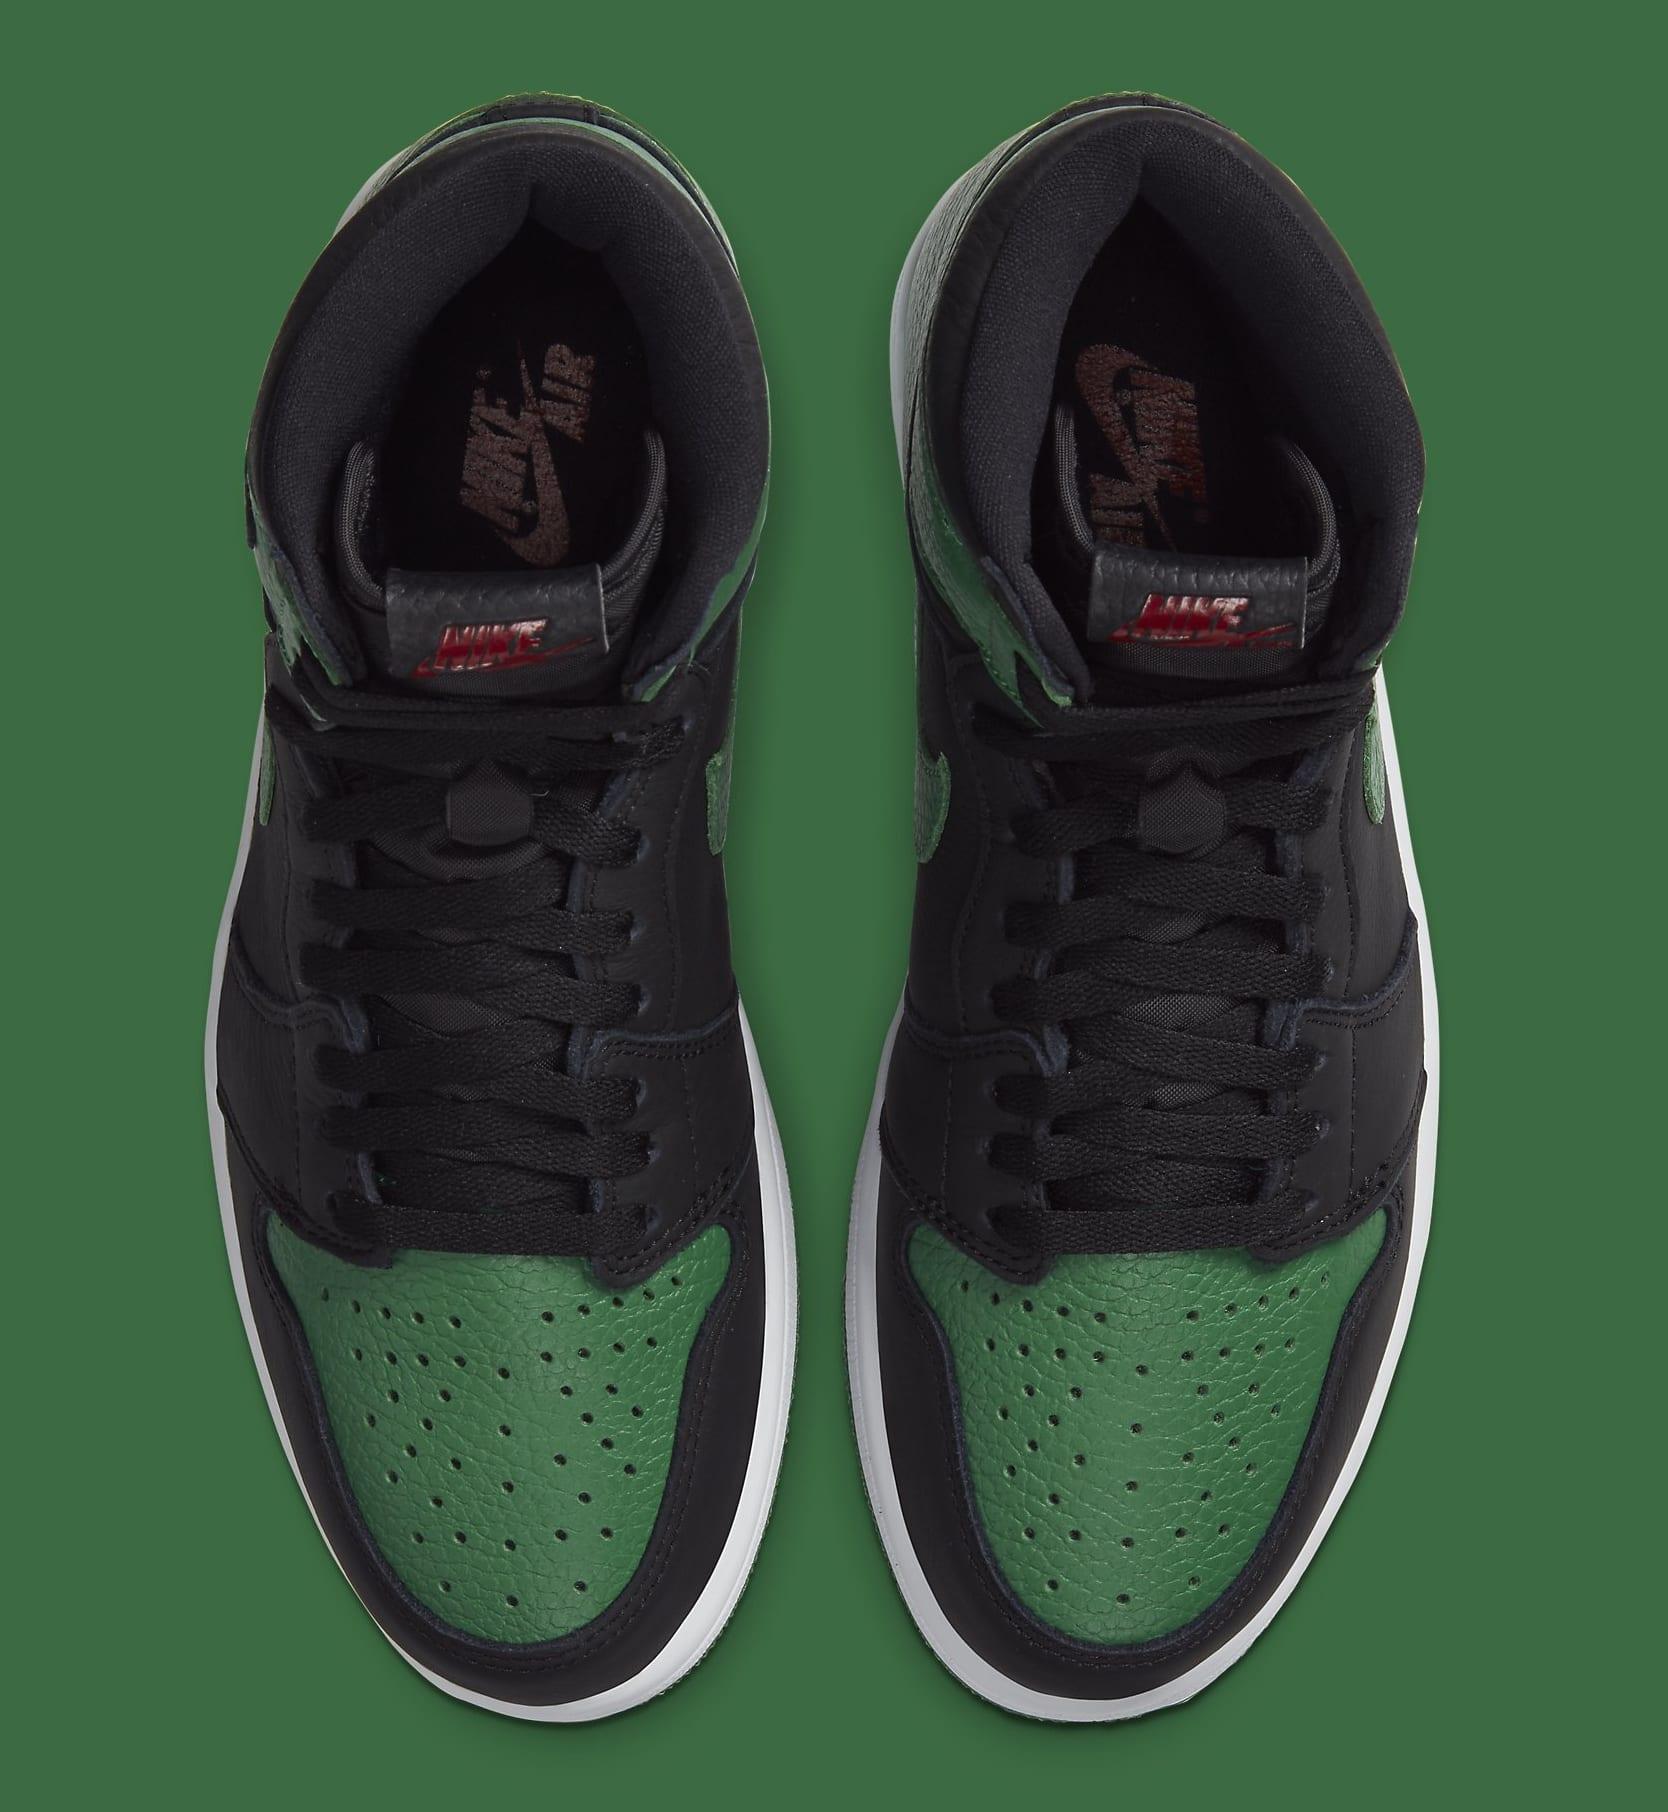 air-jordan-1-retro-high-og-pine-green-555088-030-top